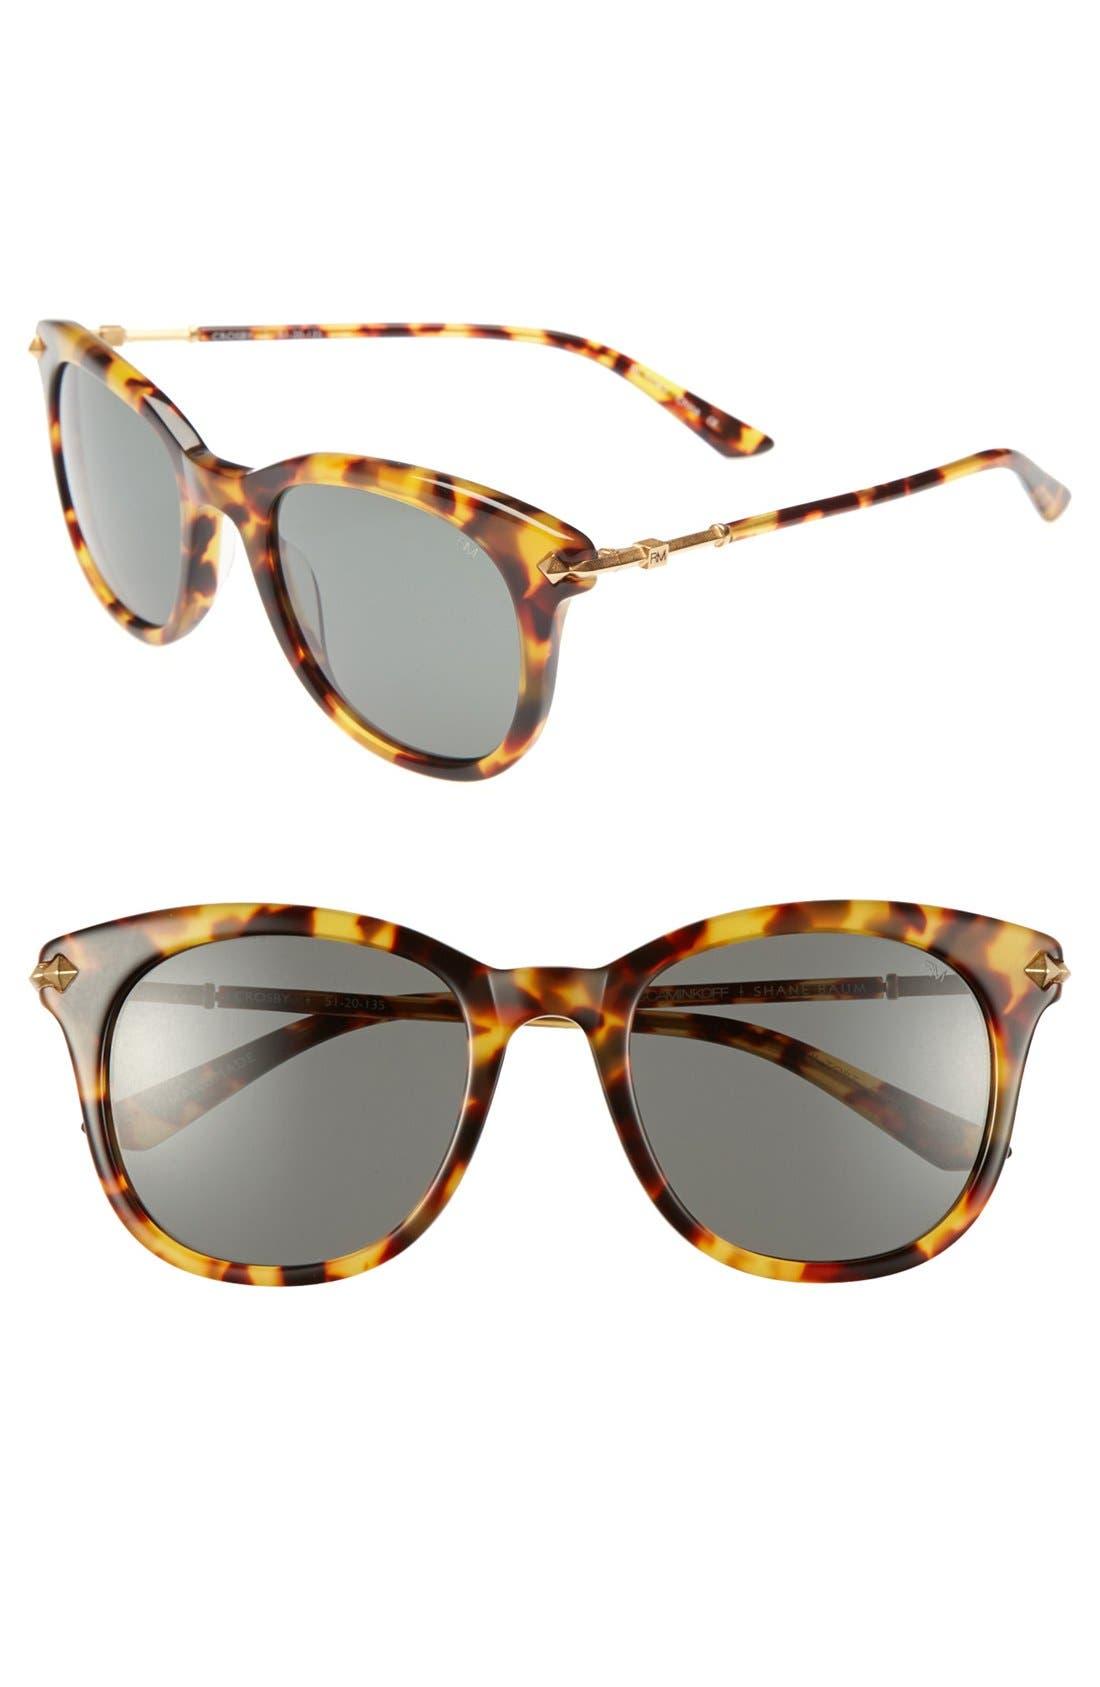 Alternate Image 1 Selected - Rebecca Minkoff 'Crosby' 51mm Sunglasses